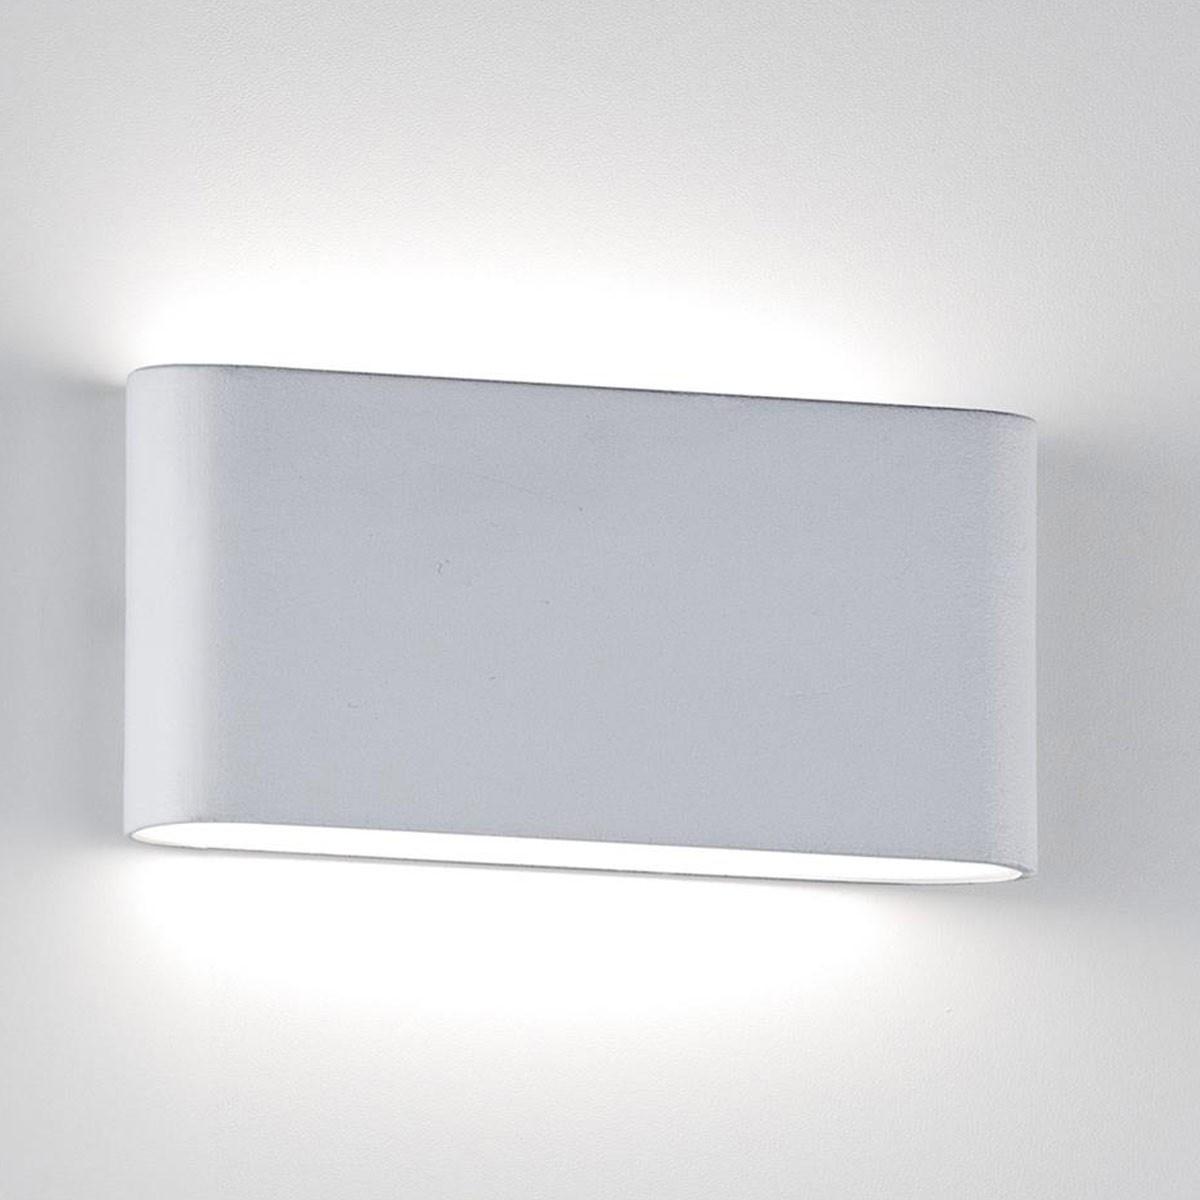 Applique faretto led isyluce interno esterno bianco 10w 3000k area illumina - Applique led esterno ...